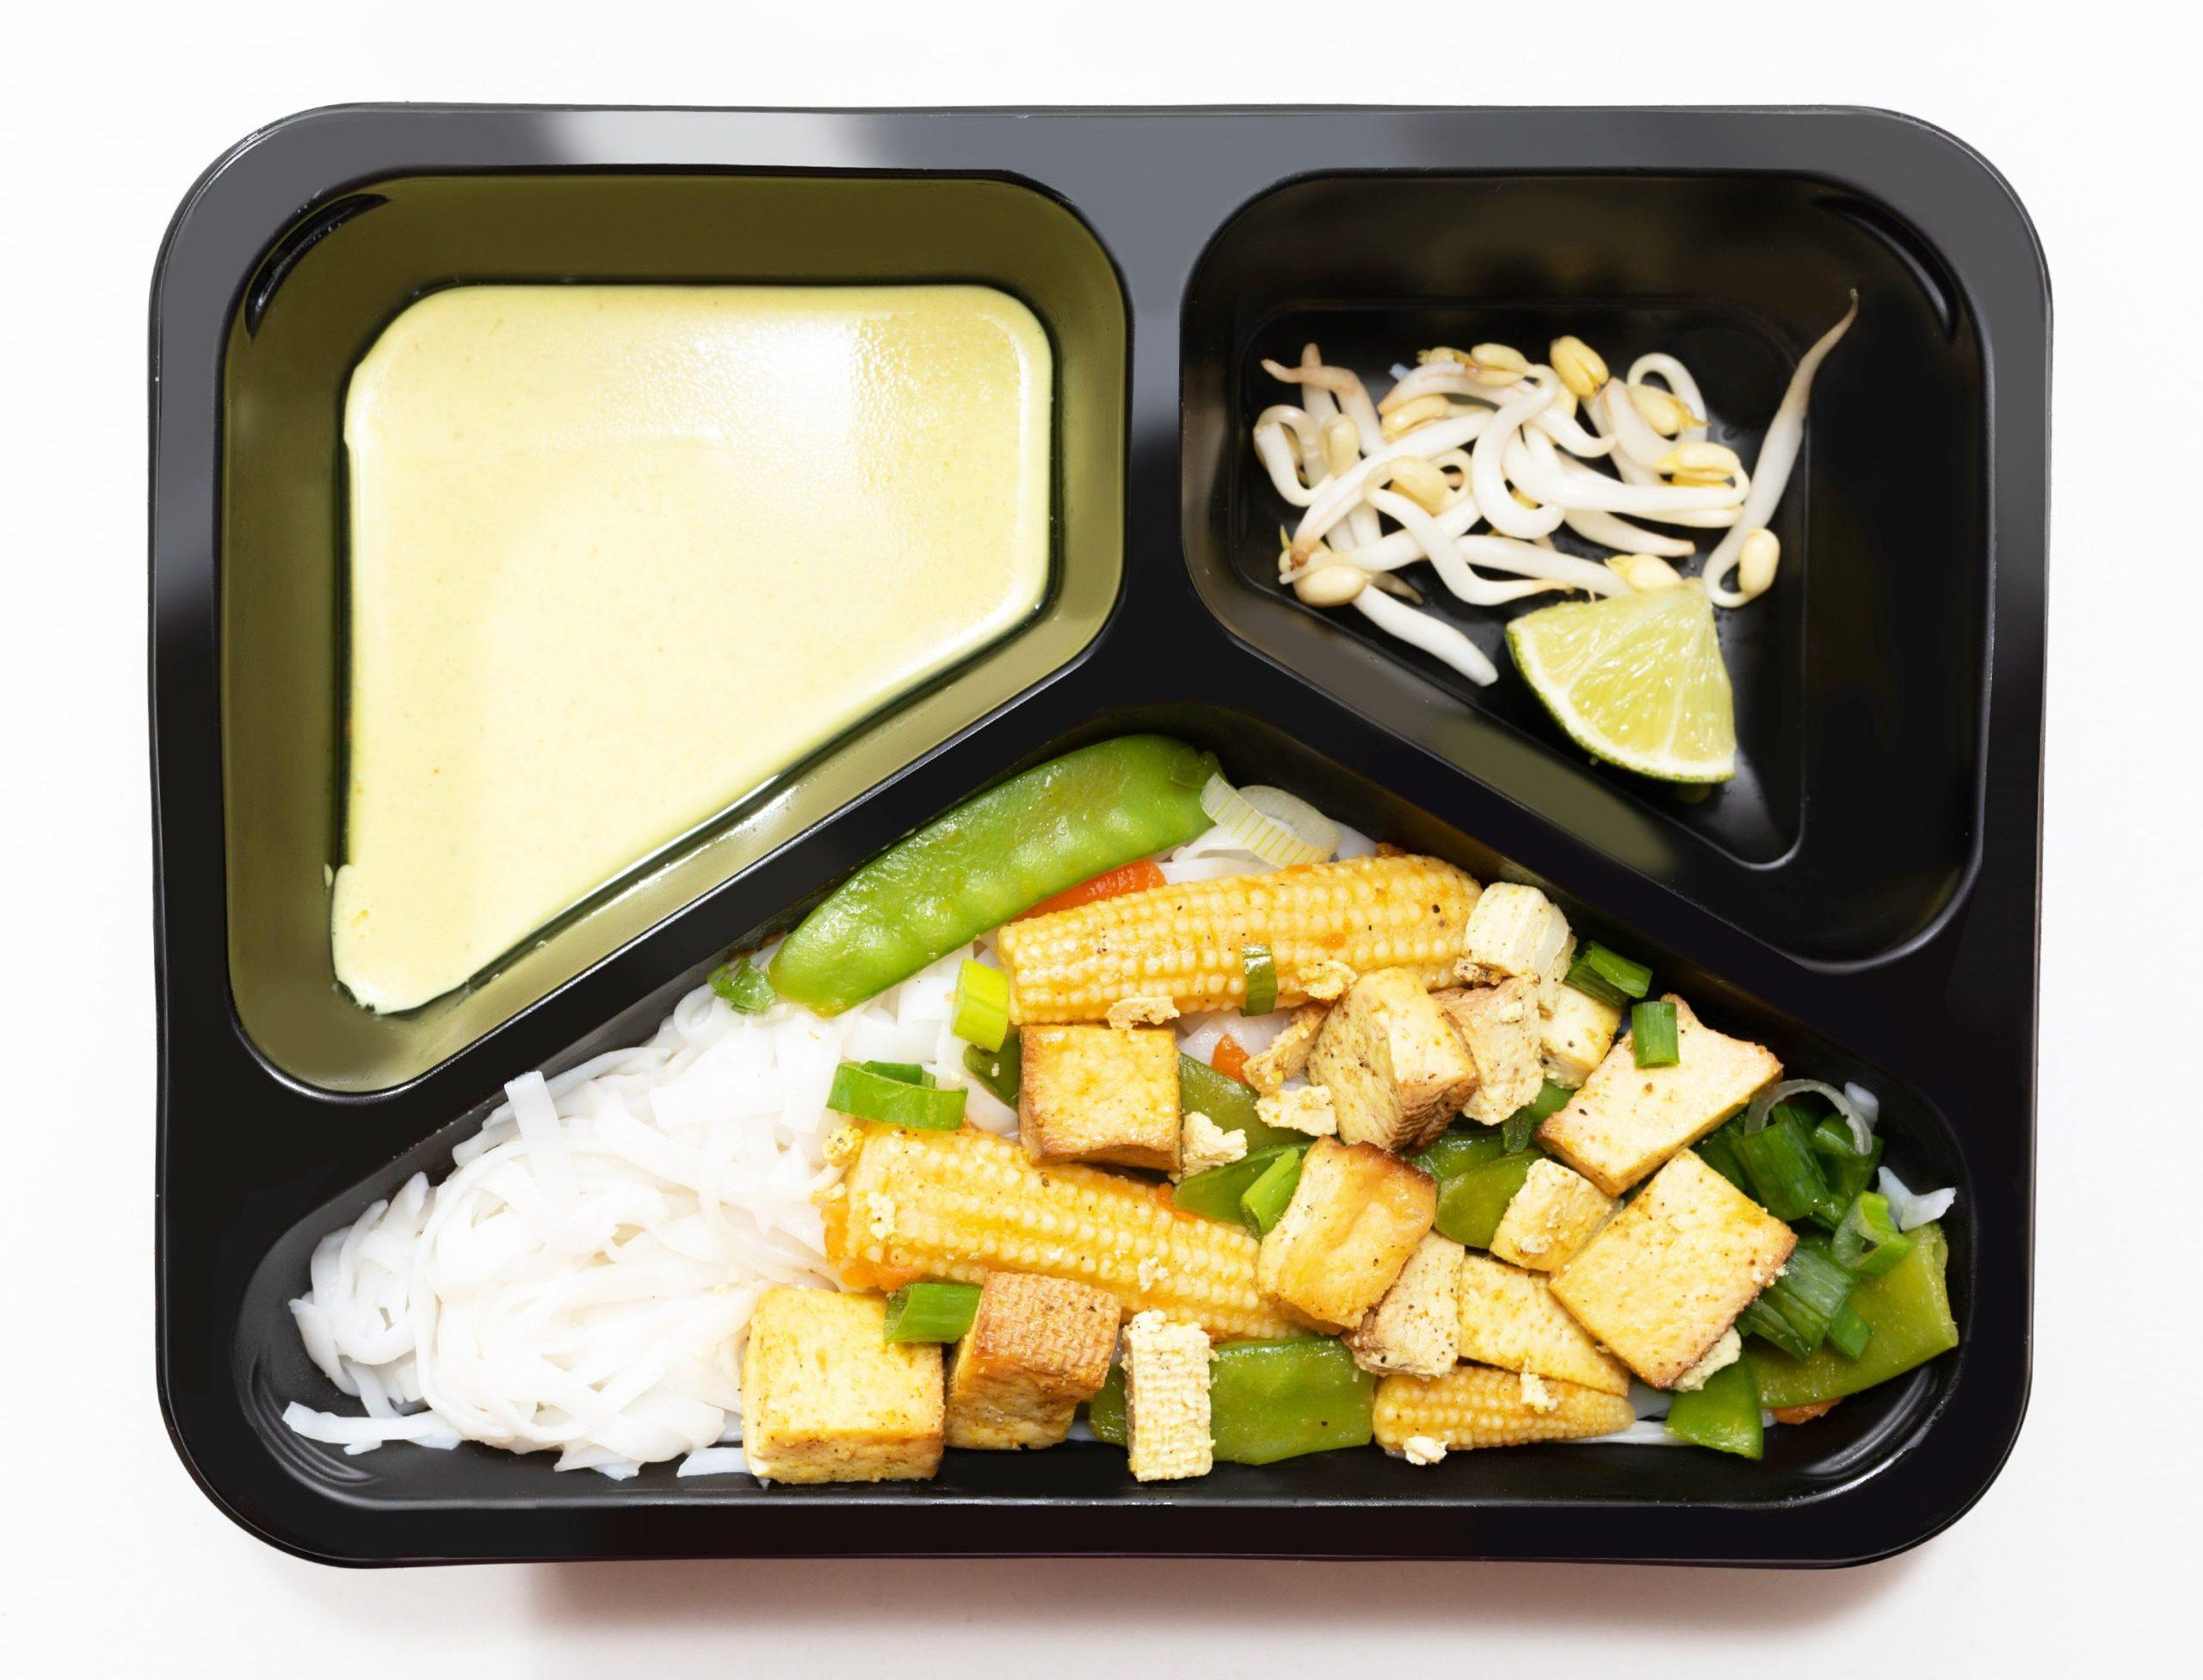 steffit tofu